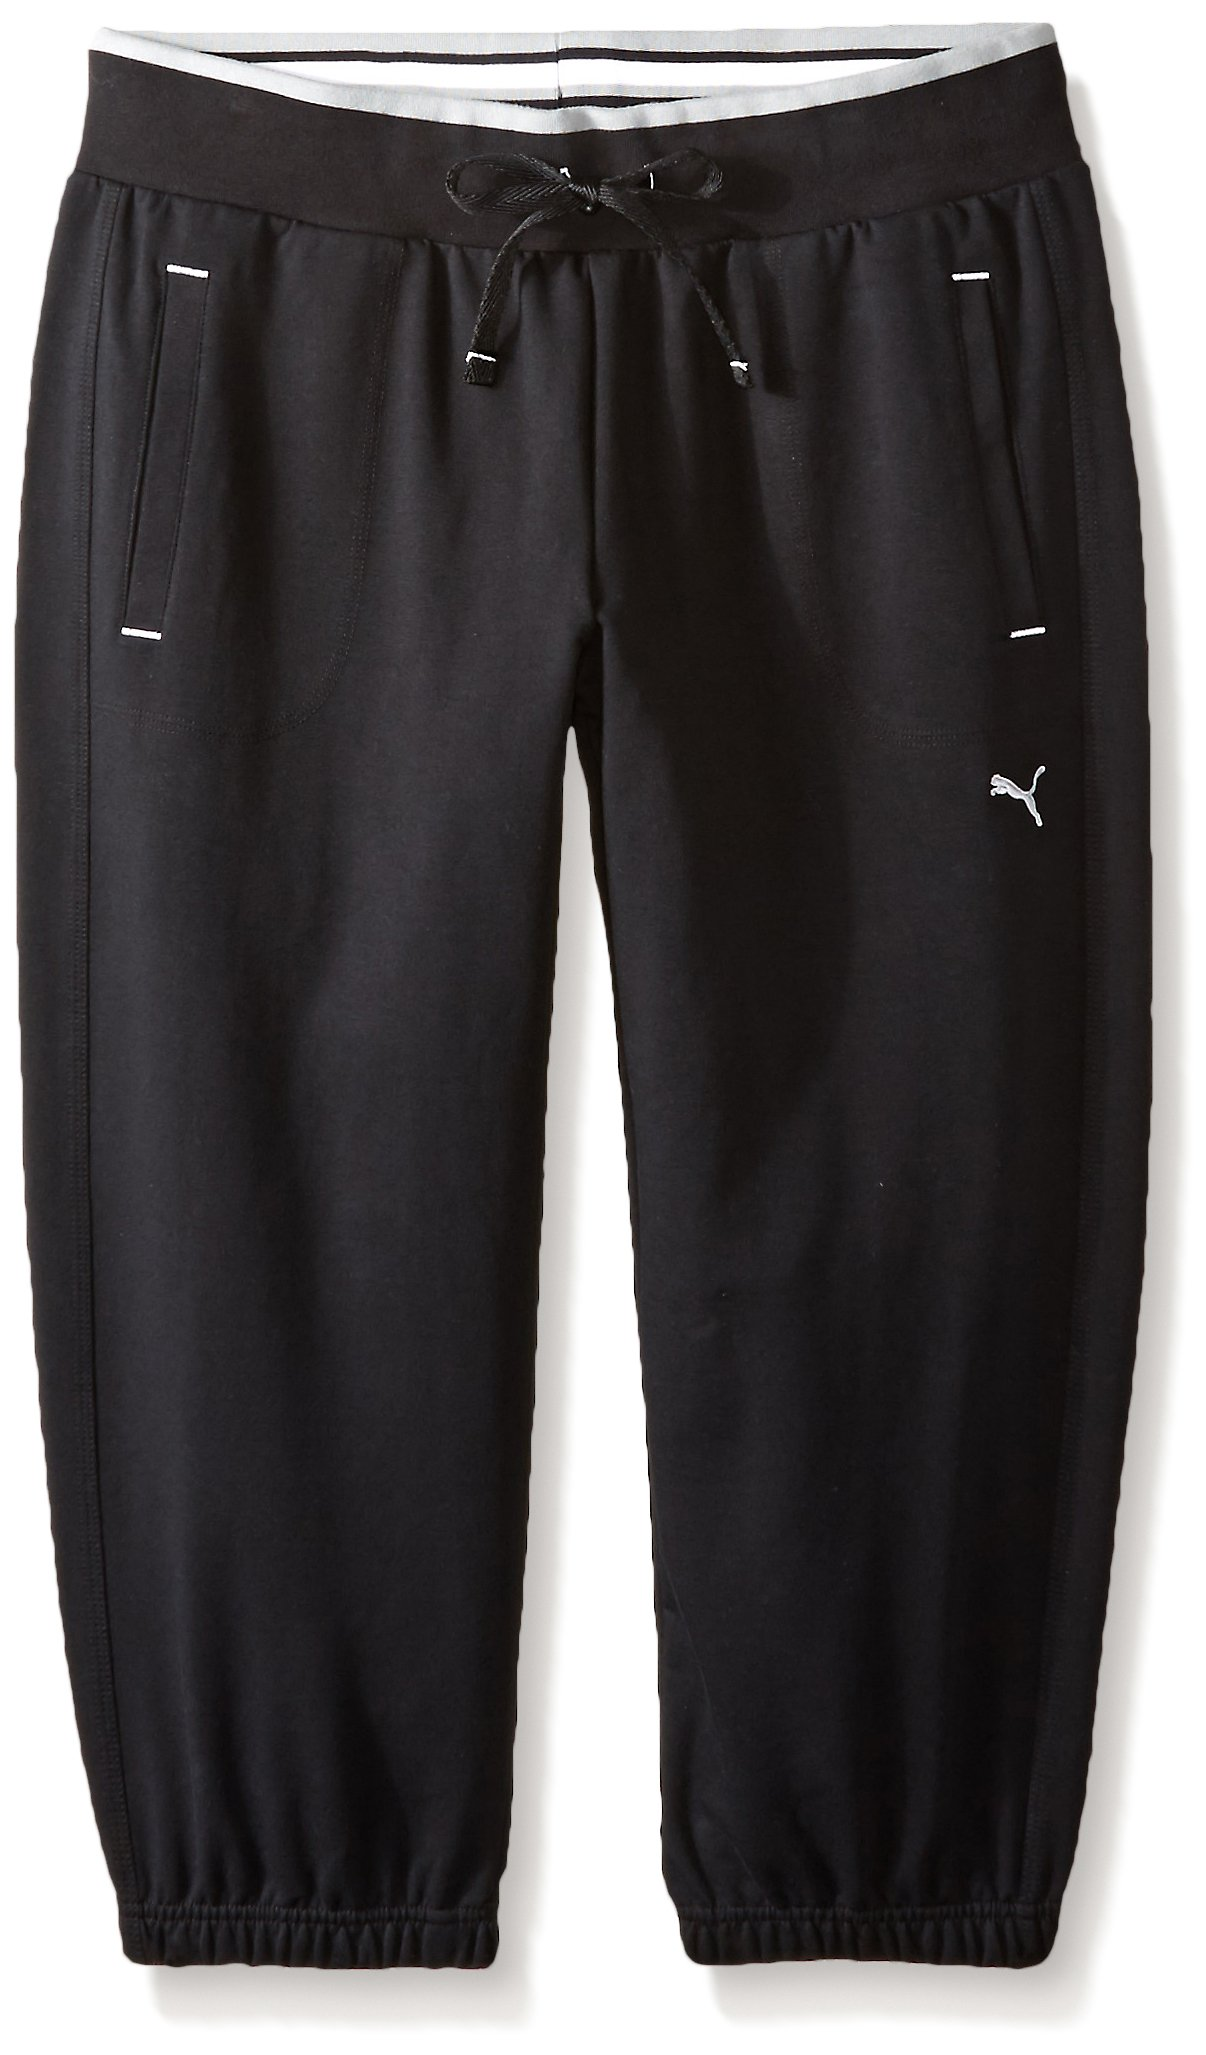 PUMA Women's Sweat Capri, Black, X-Large